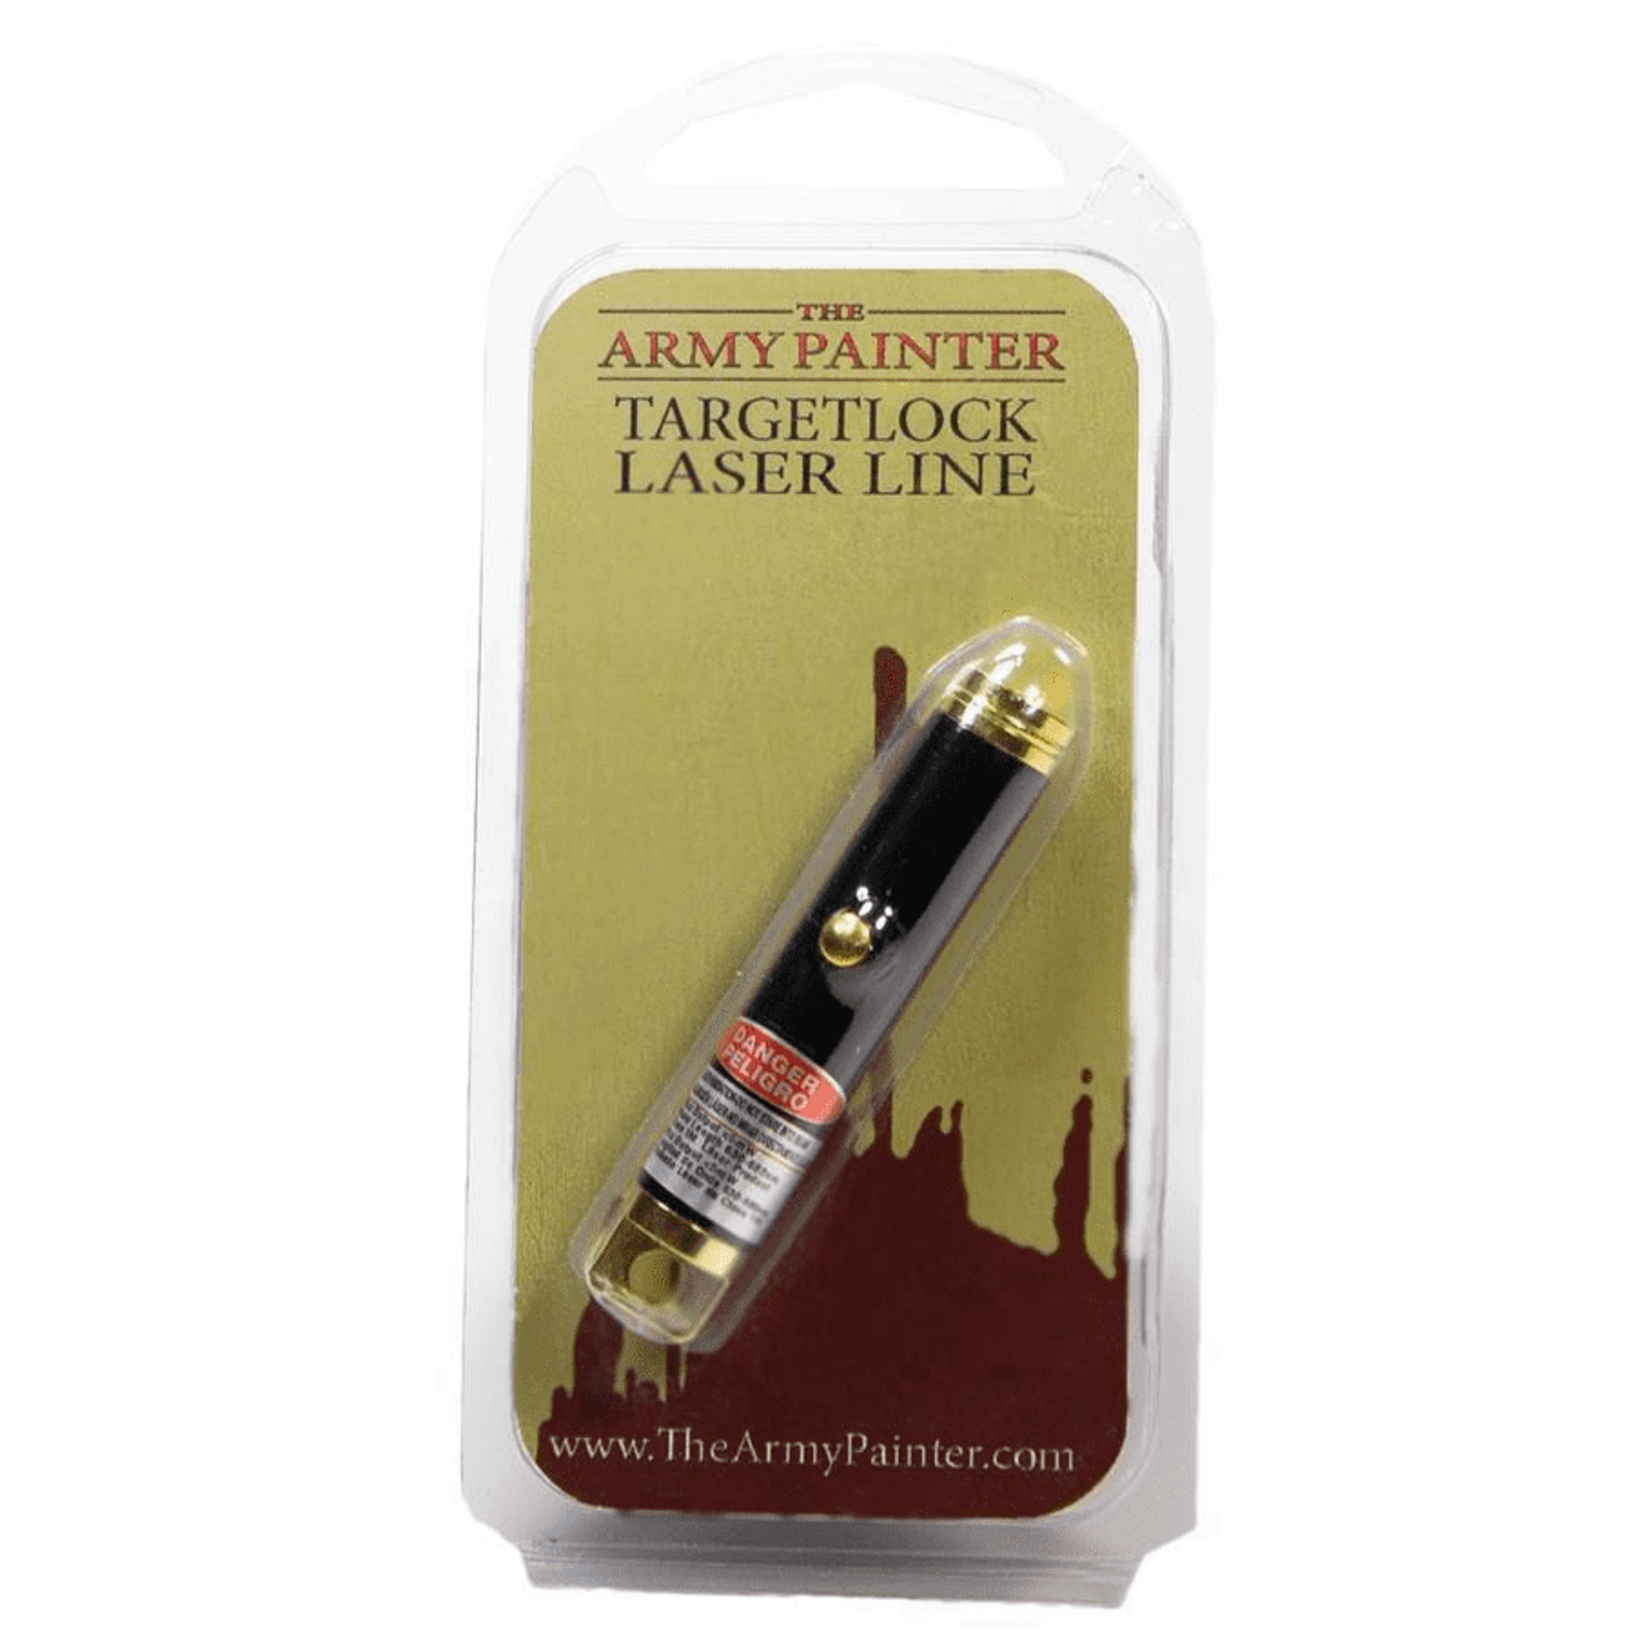 The Army Painter Targetlock Laser Line (2019)